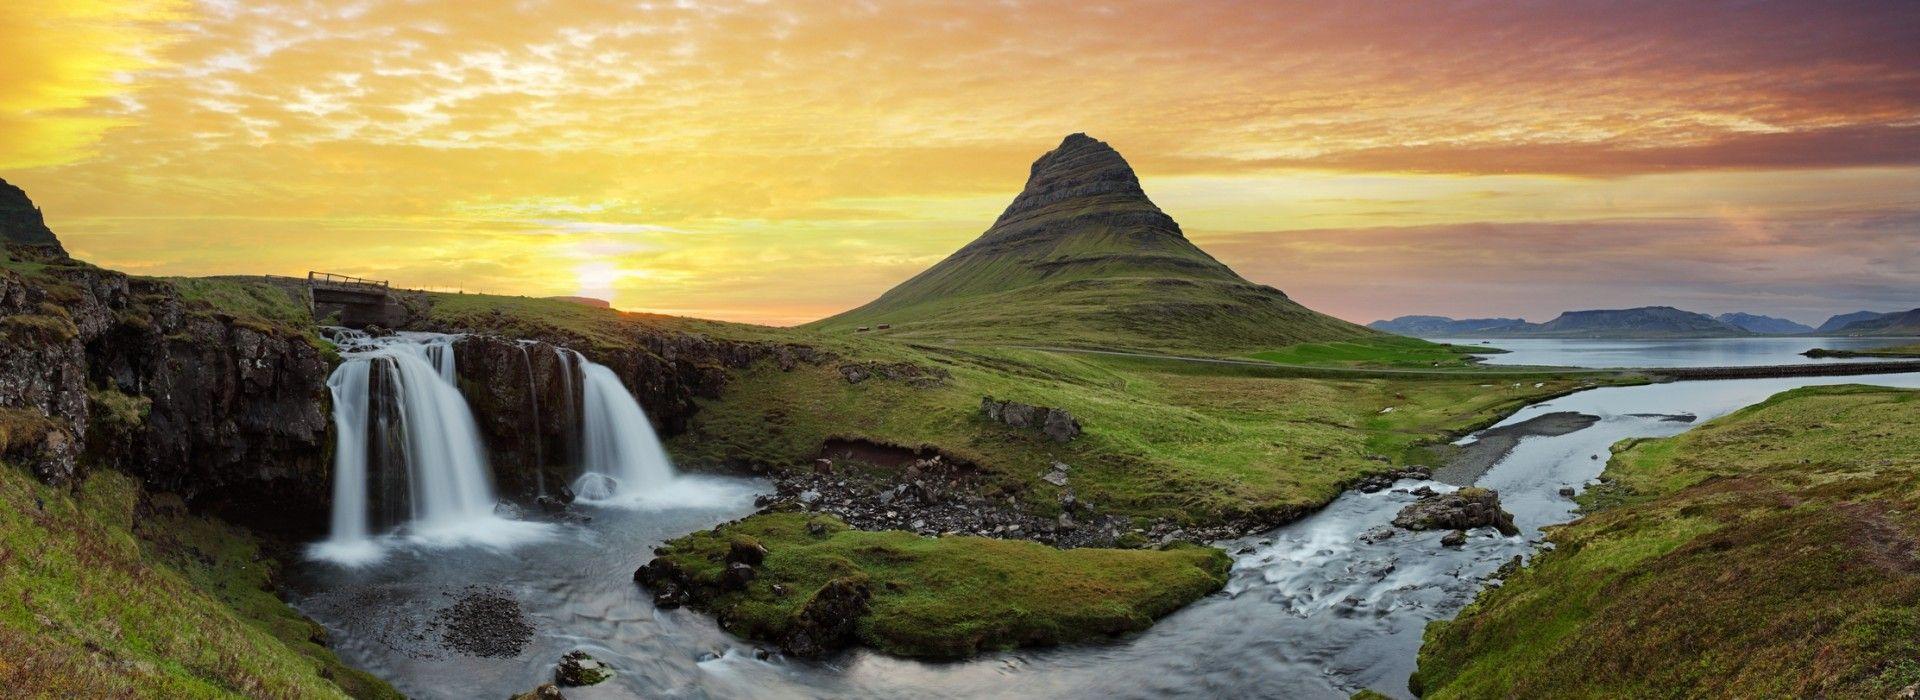 Natural landmarks sightseeing Tours in Hvolsvollur